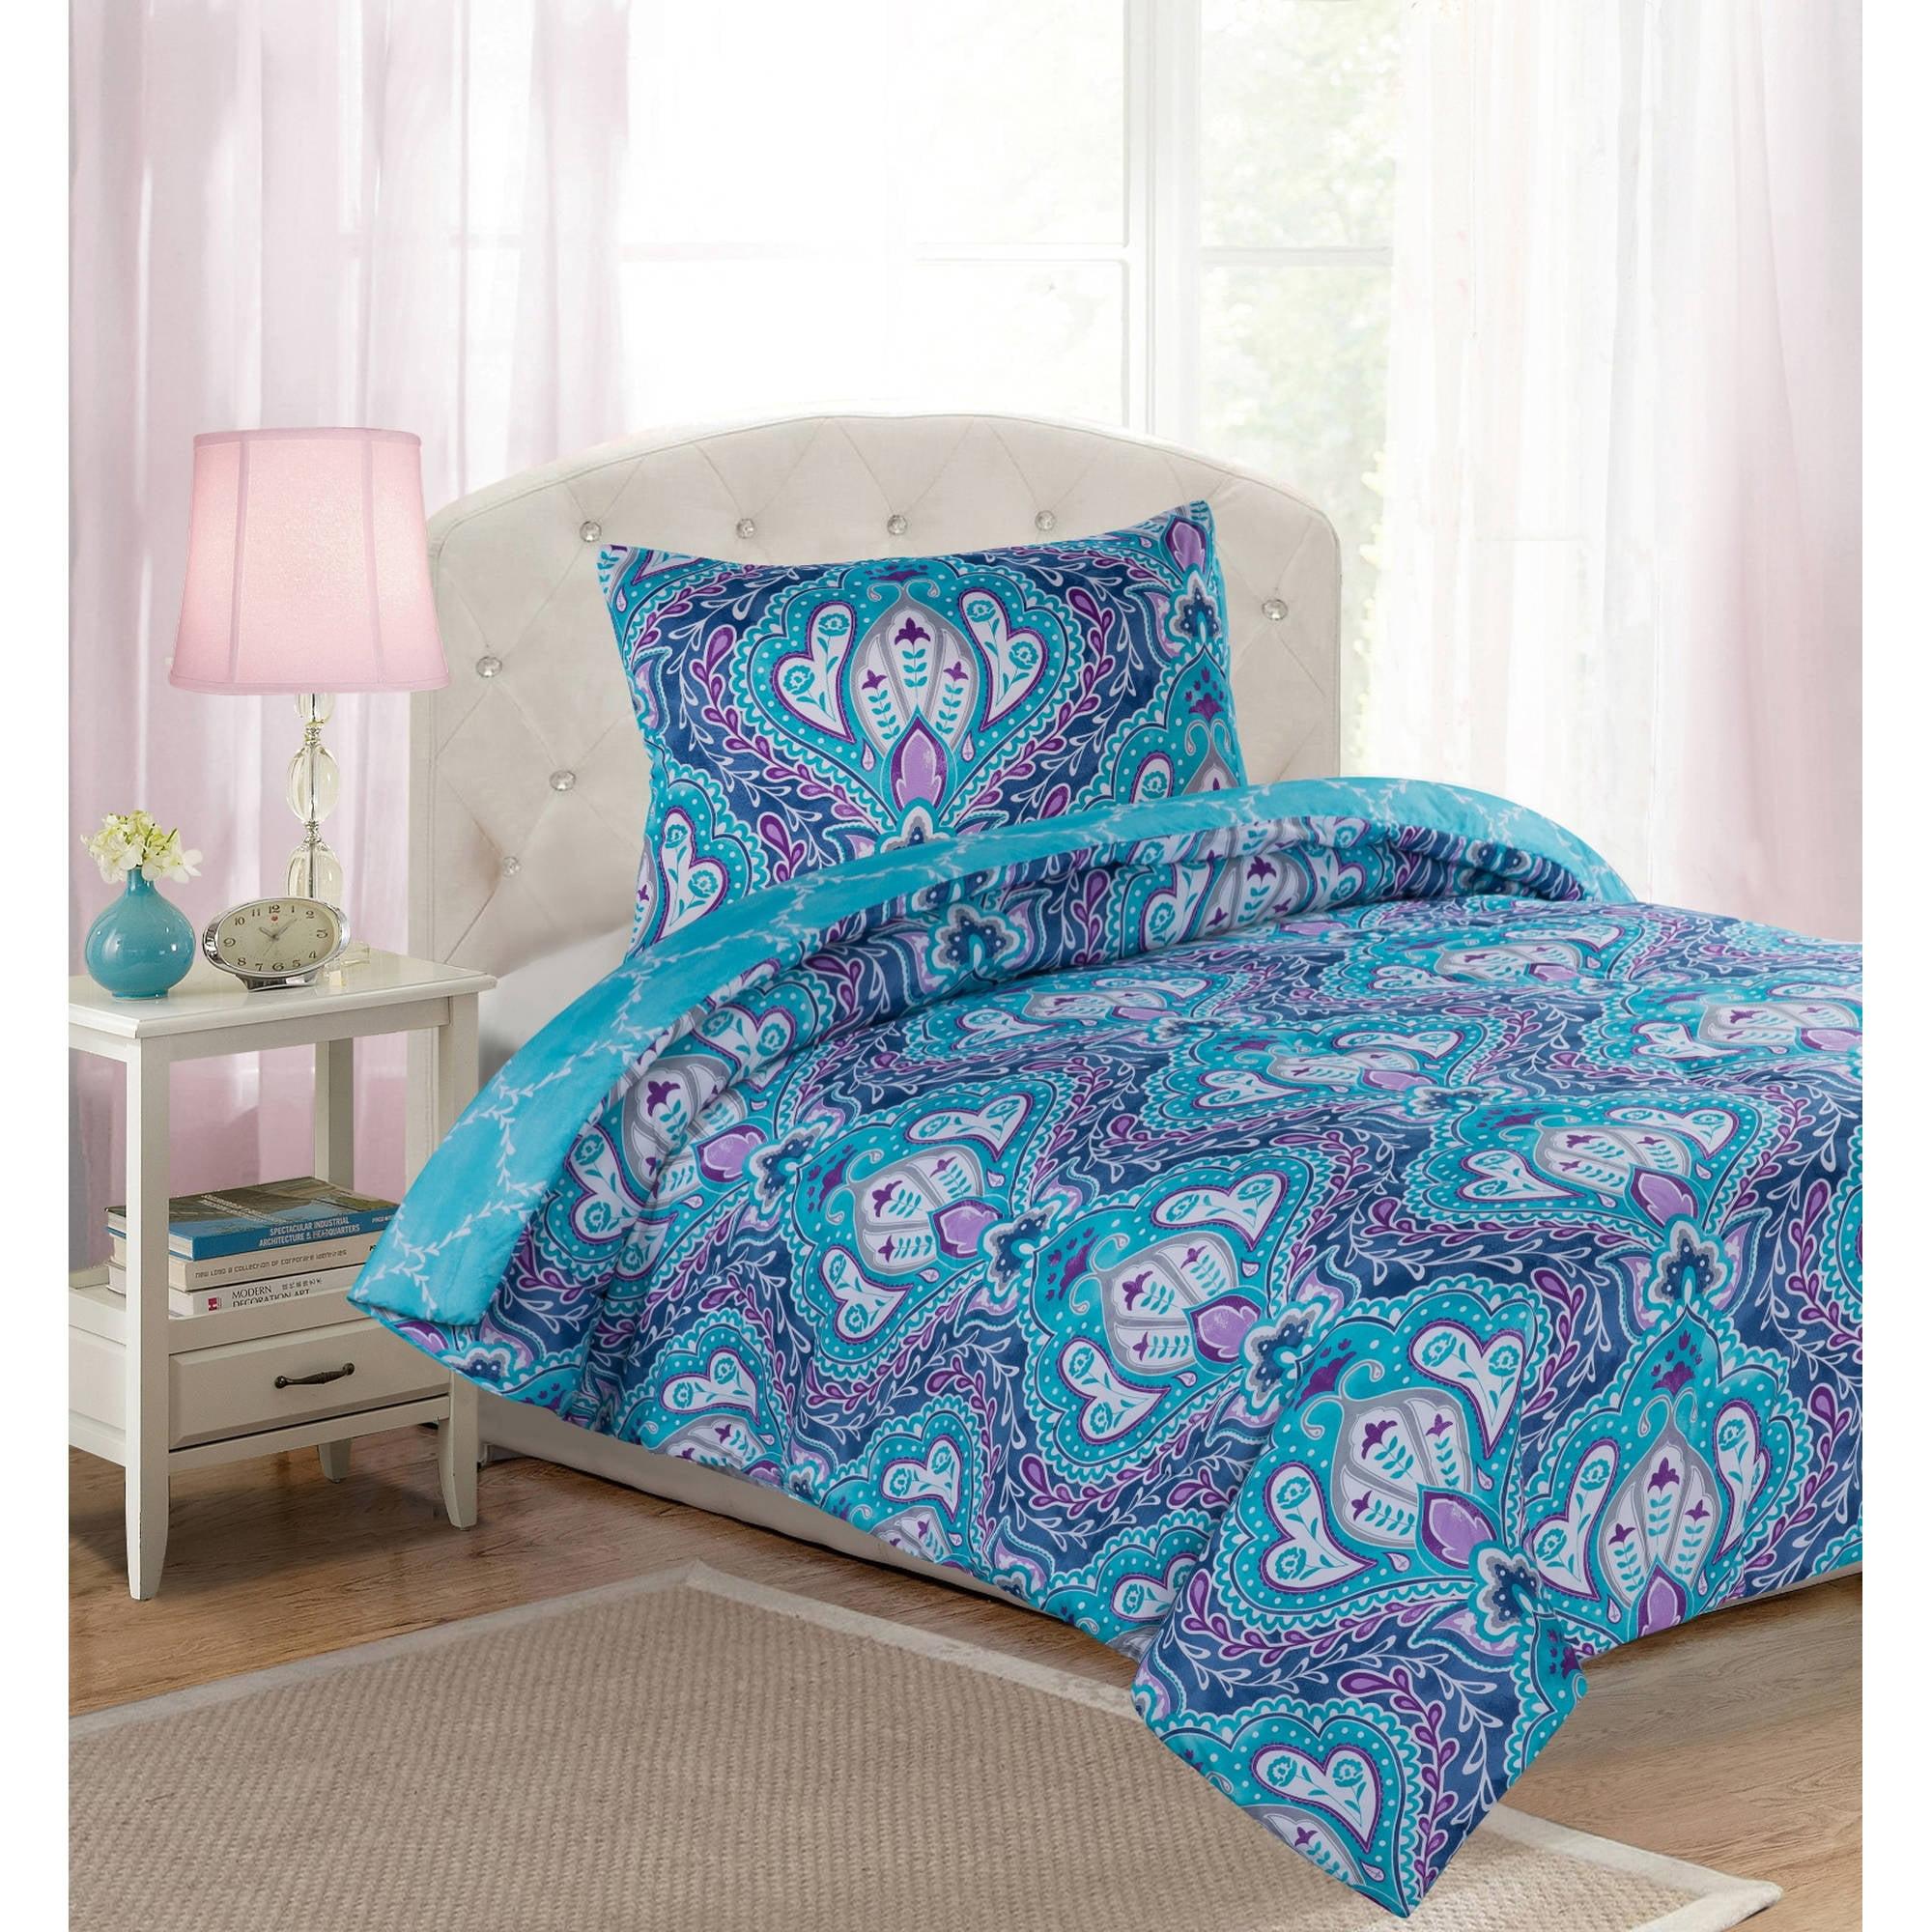 Your Zone Arabesque Floral Comforter Set